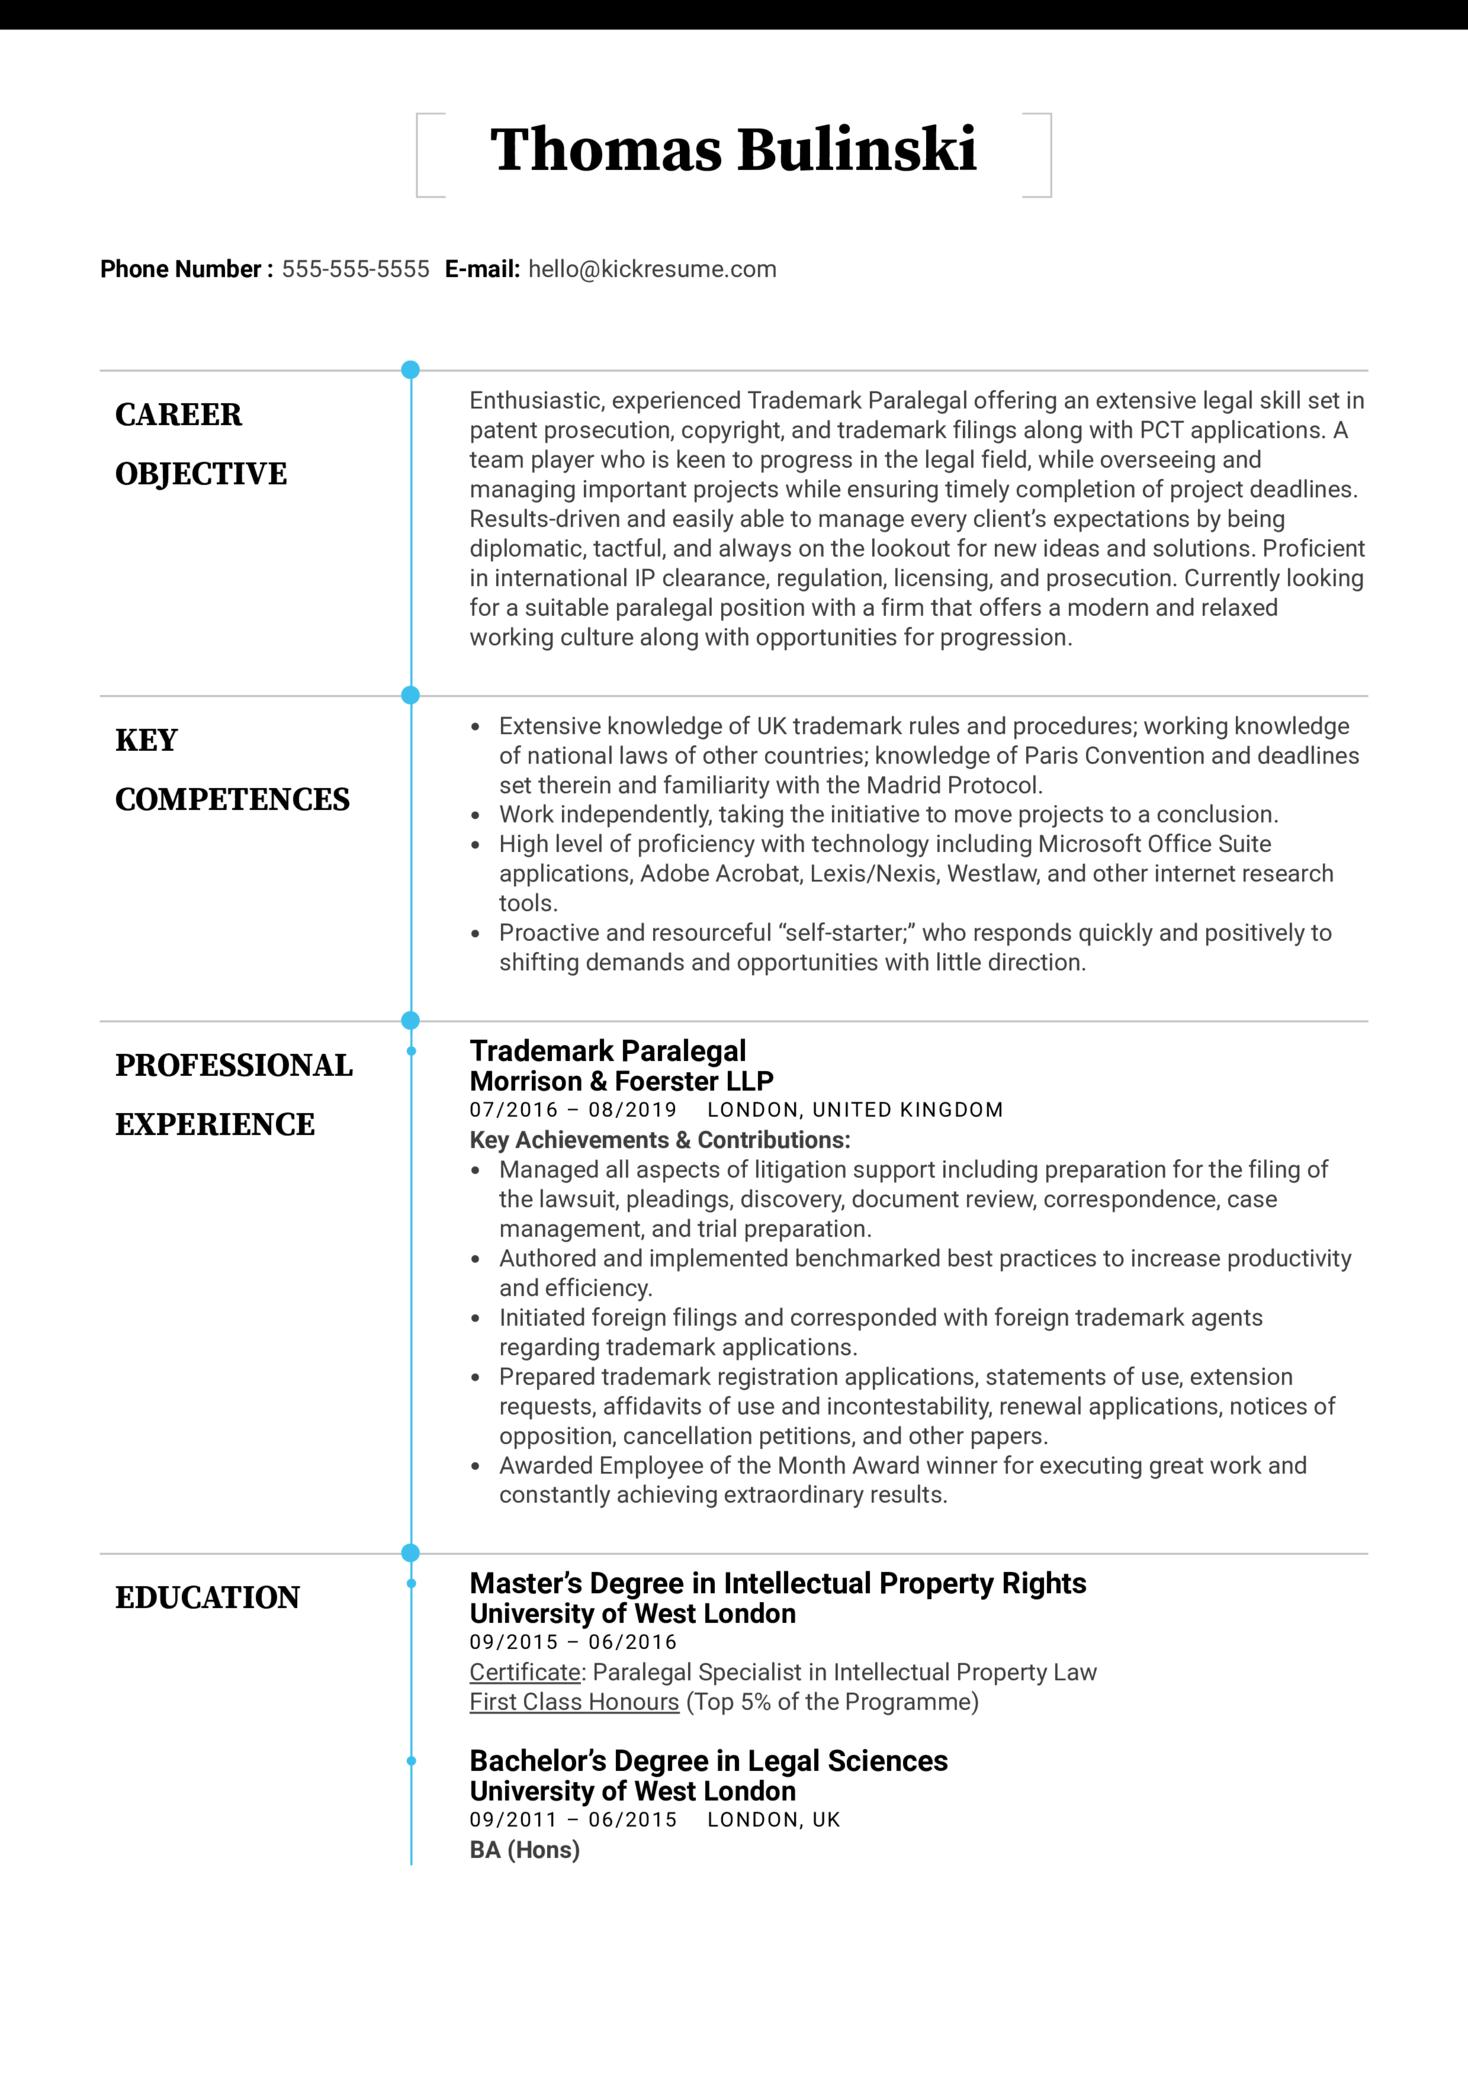 Trademark Paralegal Resume Sample (Teil 1)